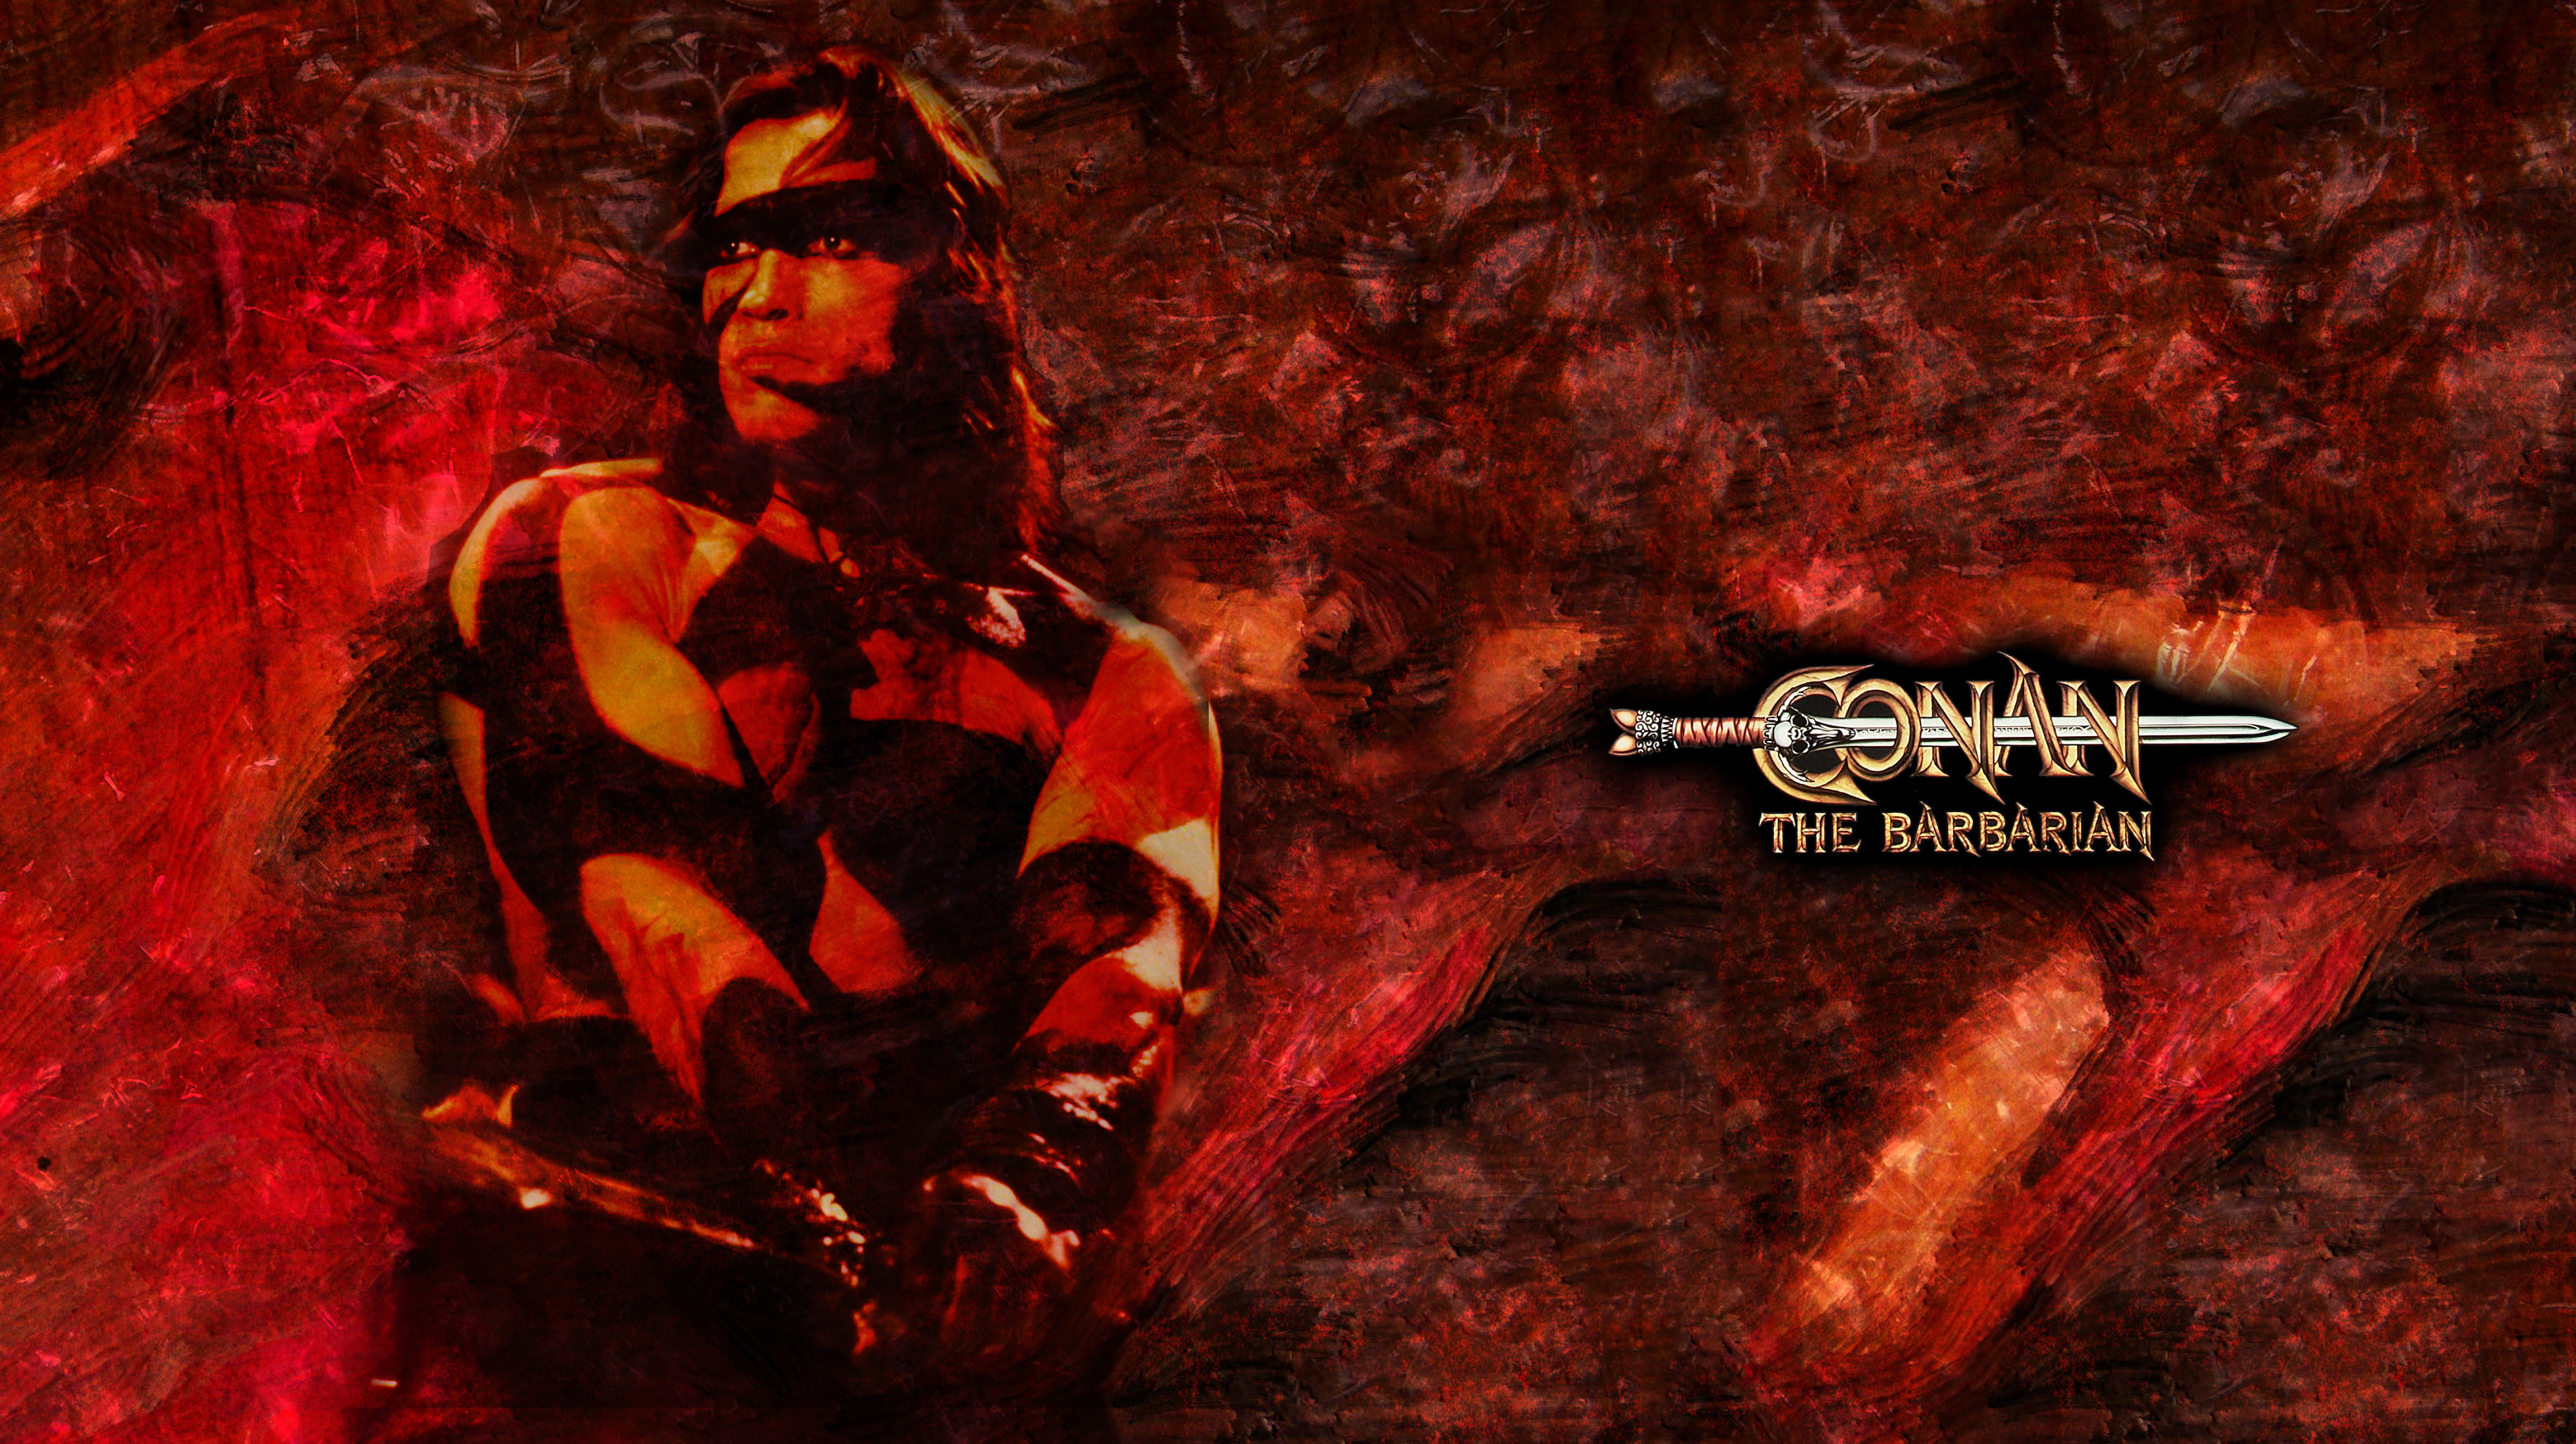 Conan the barbarian henti erotic pictures